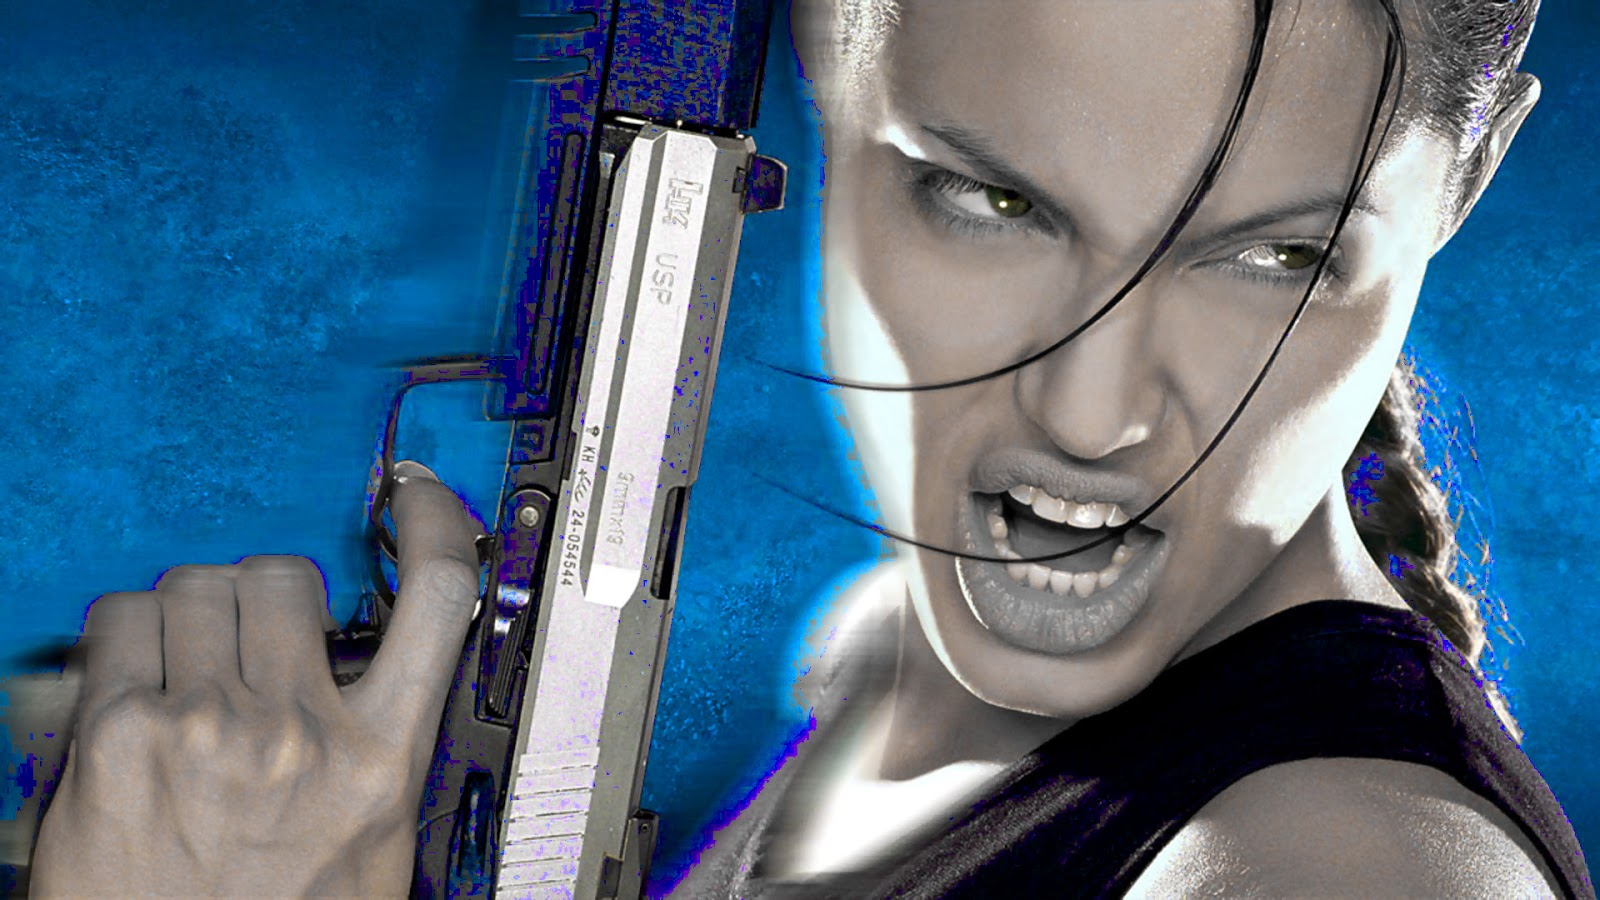 http://4.bp.blogspot.com/-iC7a80AdFes/UPGkFYhcHYI/AAAAAAAADck/5TO0HrLD87w/s1600/angelina+jolie+gun+weapon+lara+croft.jpg